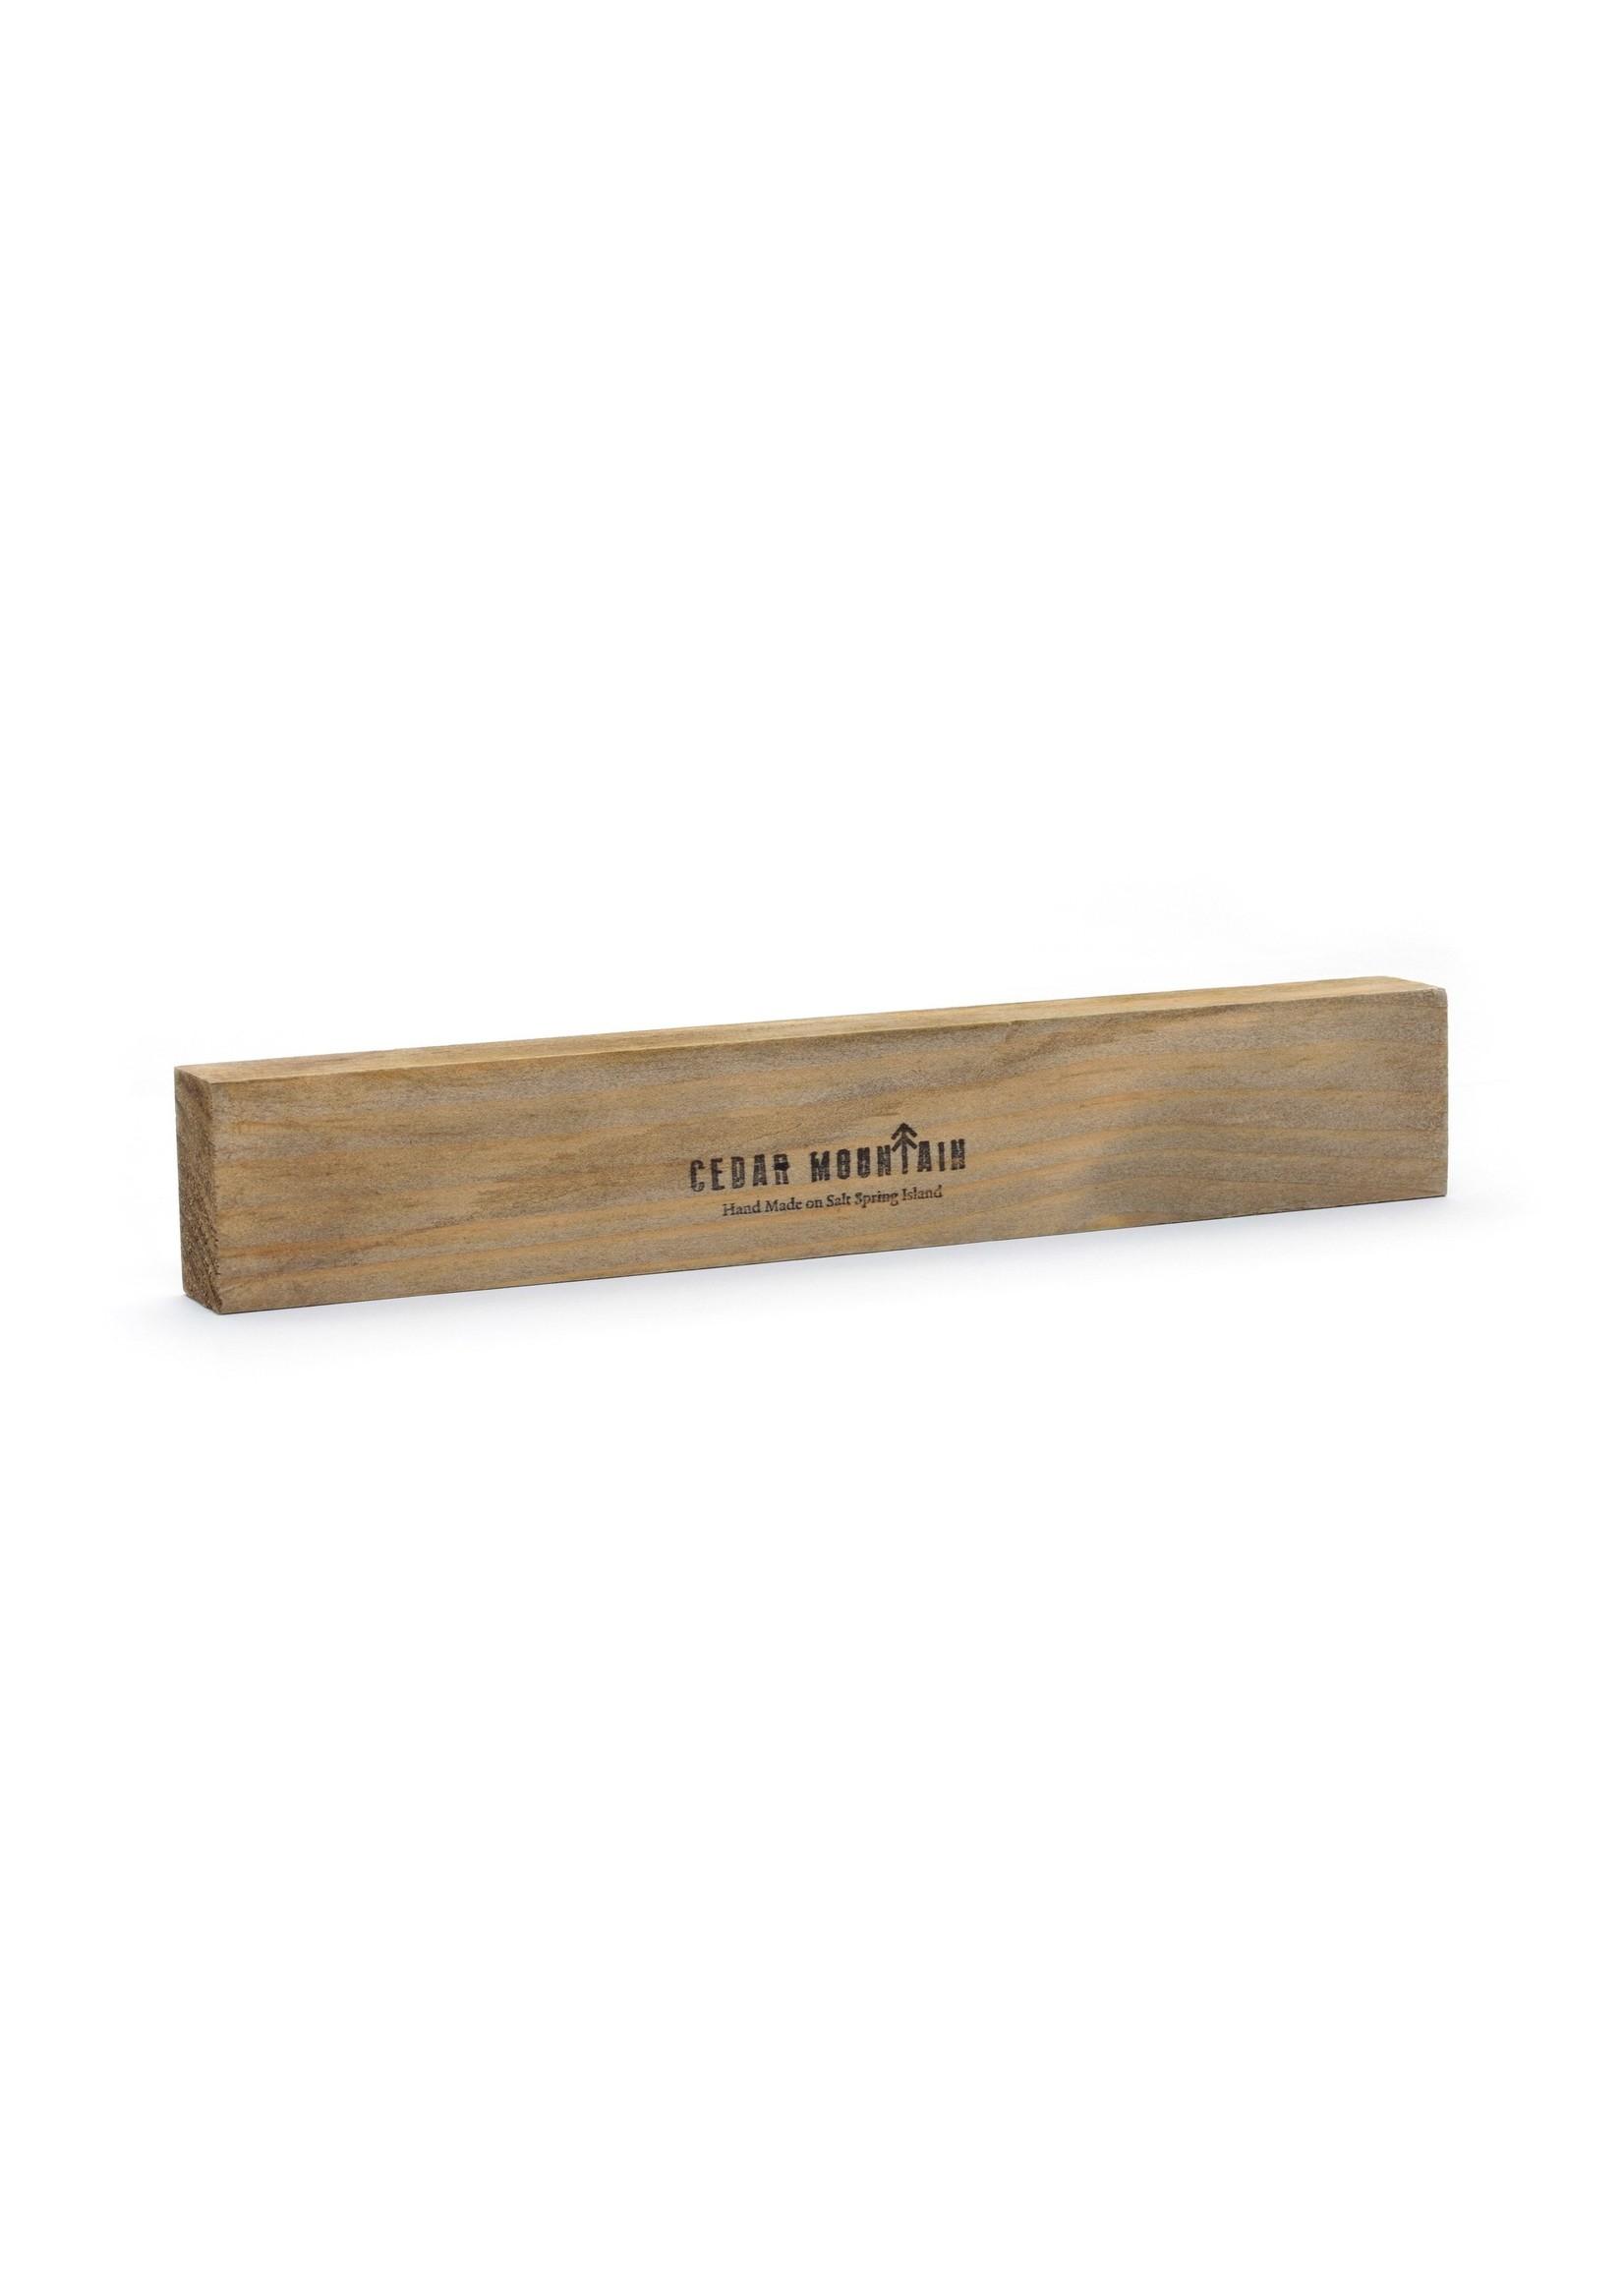 Cedar Mountain Studios Believe in Tomorrow Timber Bit